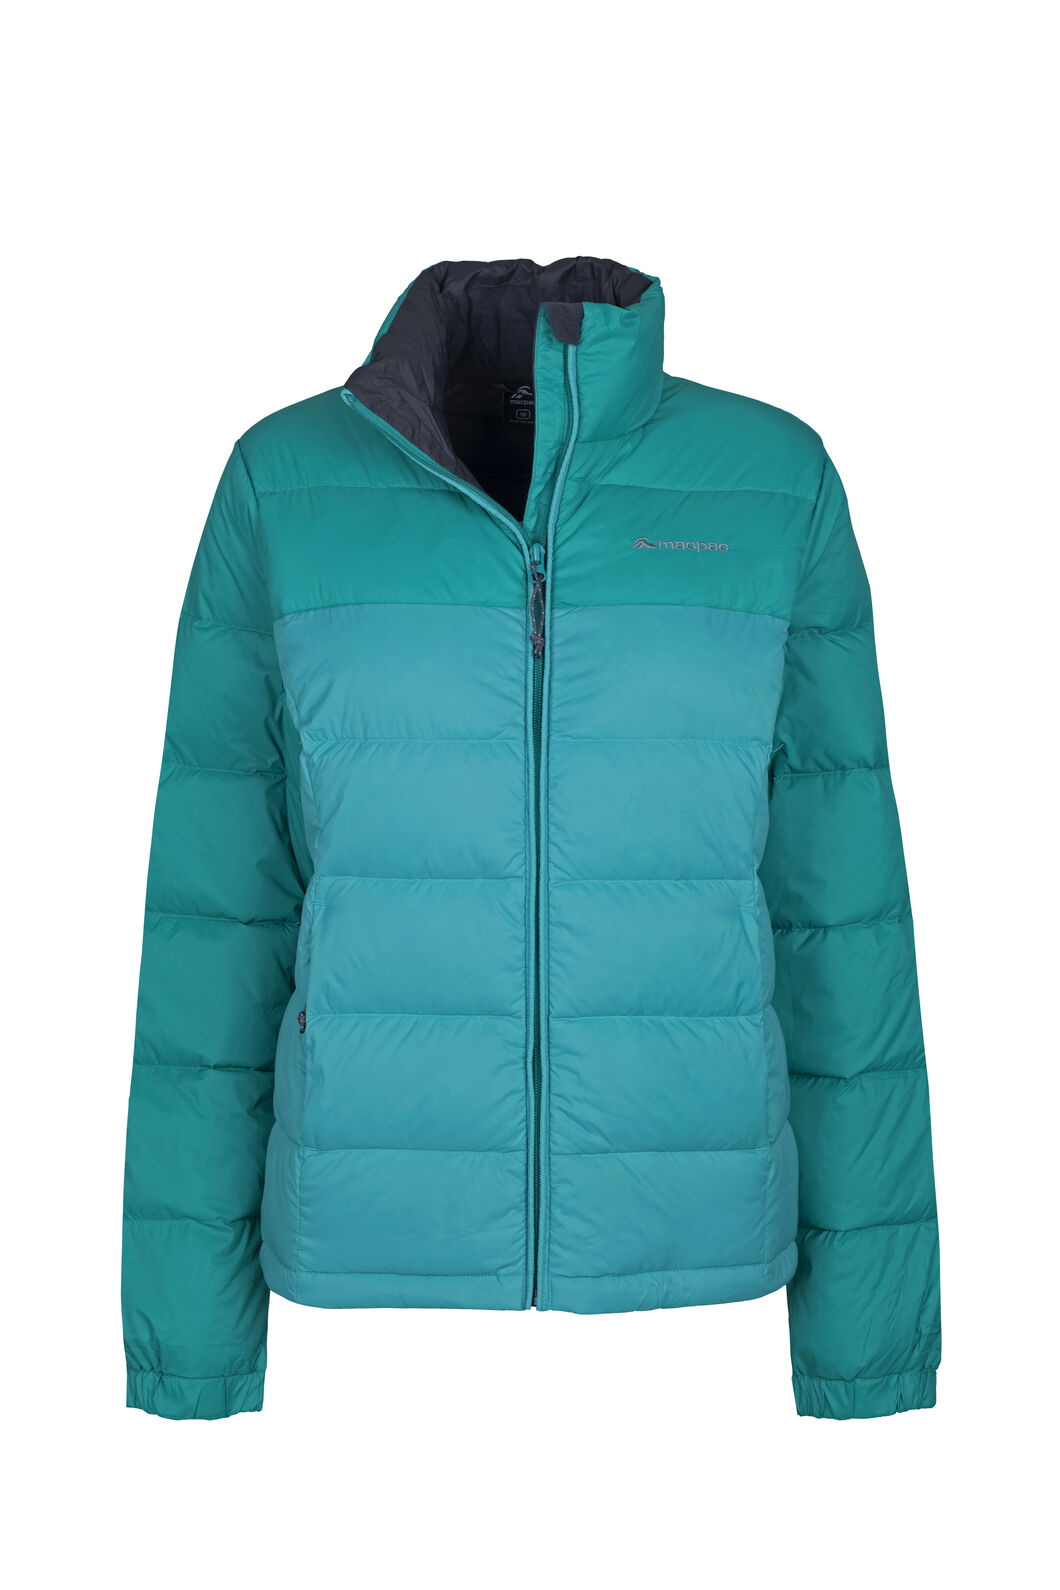 Macpac Halo Down Jacket - Women's, Latigo Bay/Parasailing, hi-res